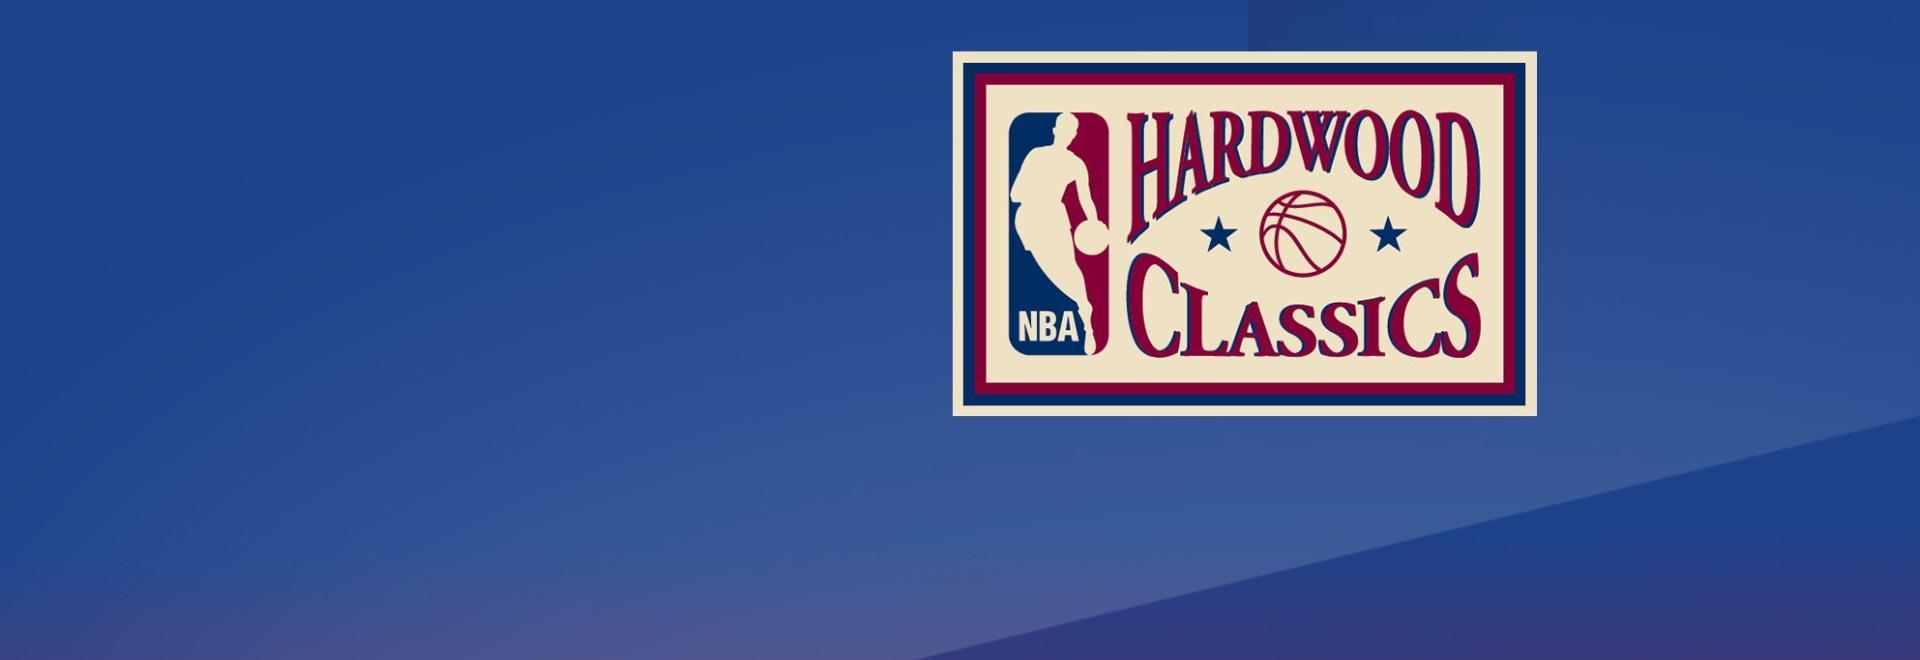 Knicks - Lakers 1972. Game 5. NBA Finals